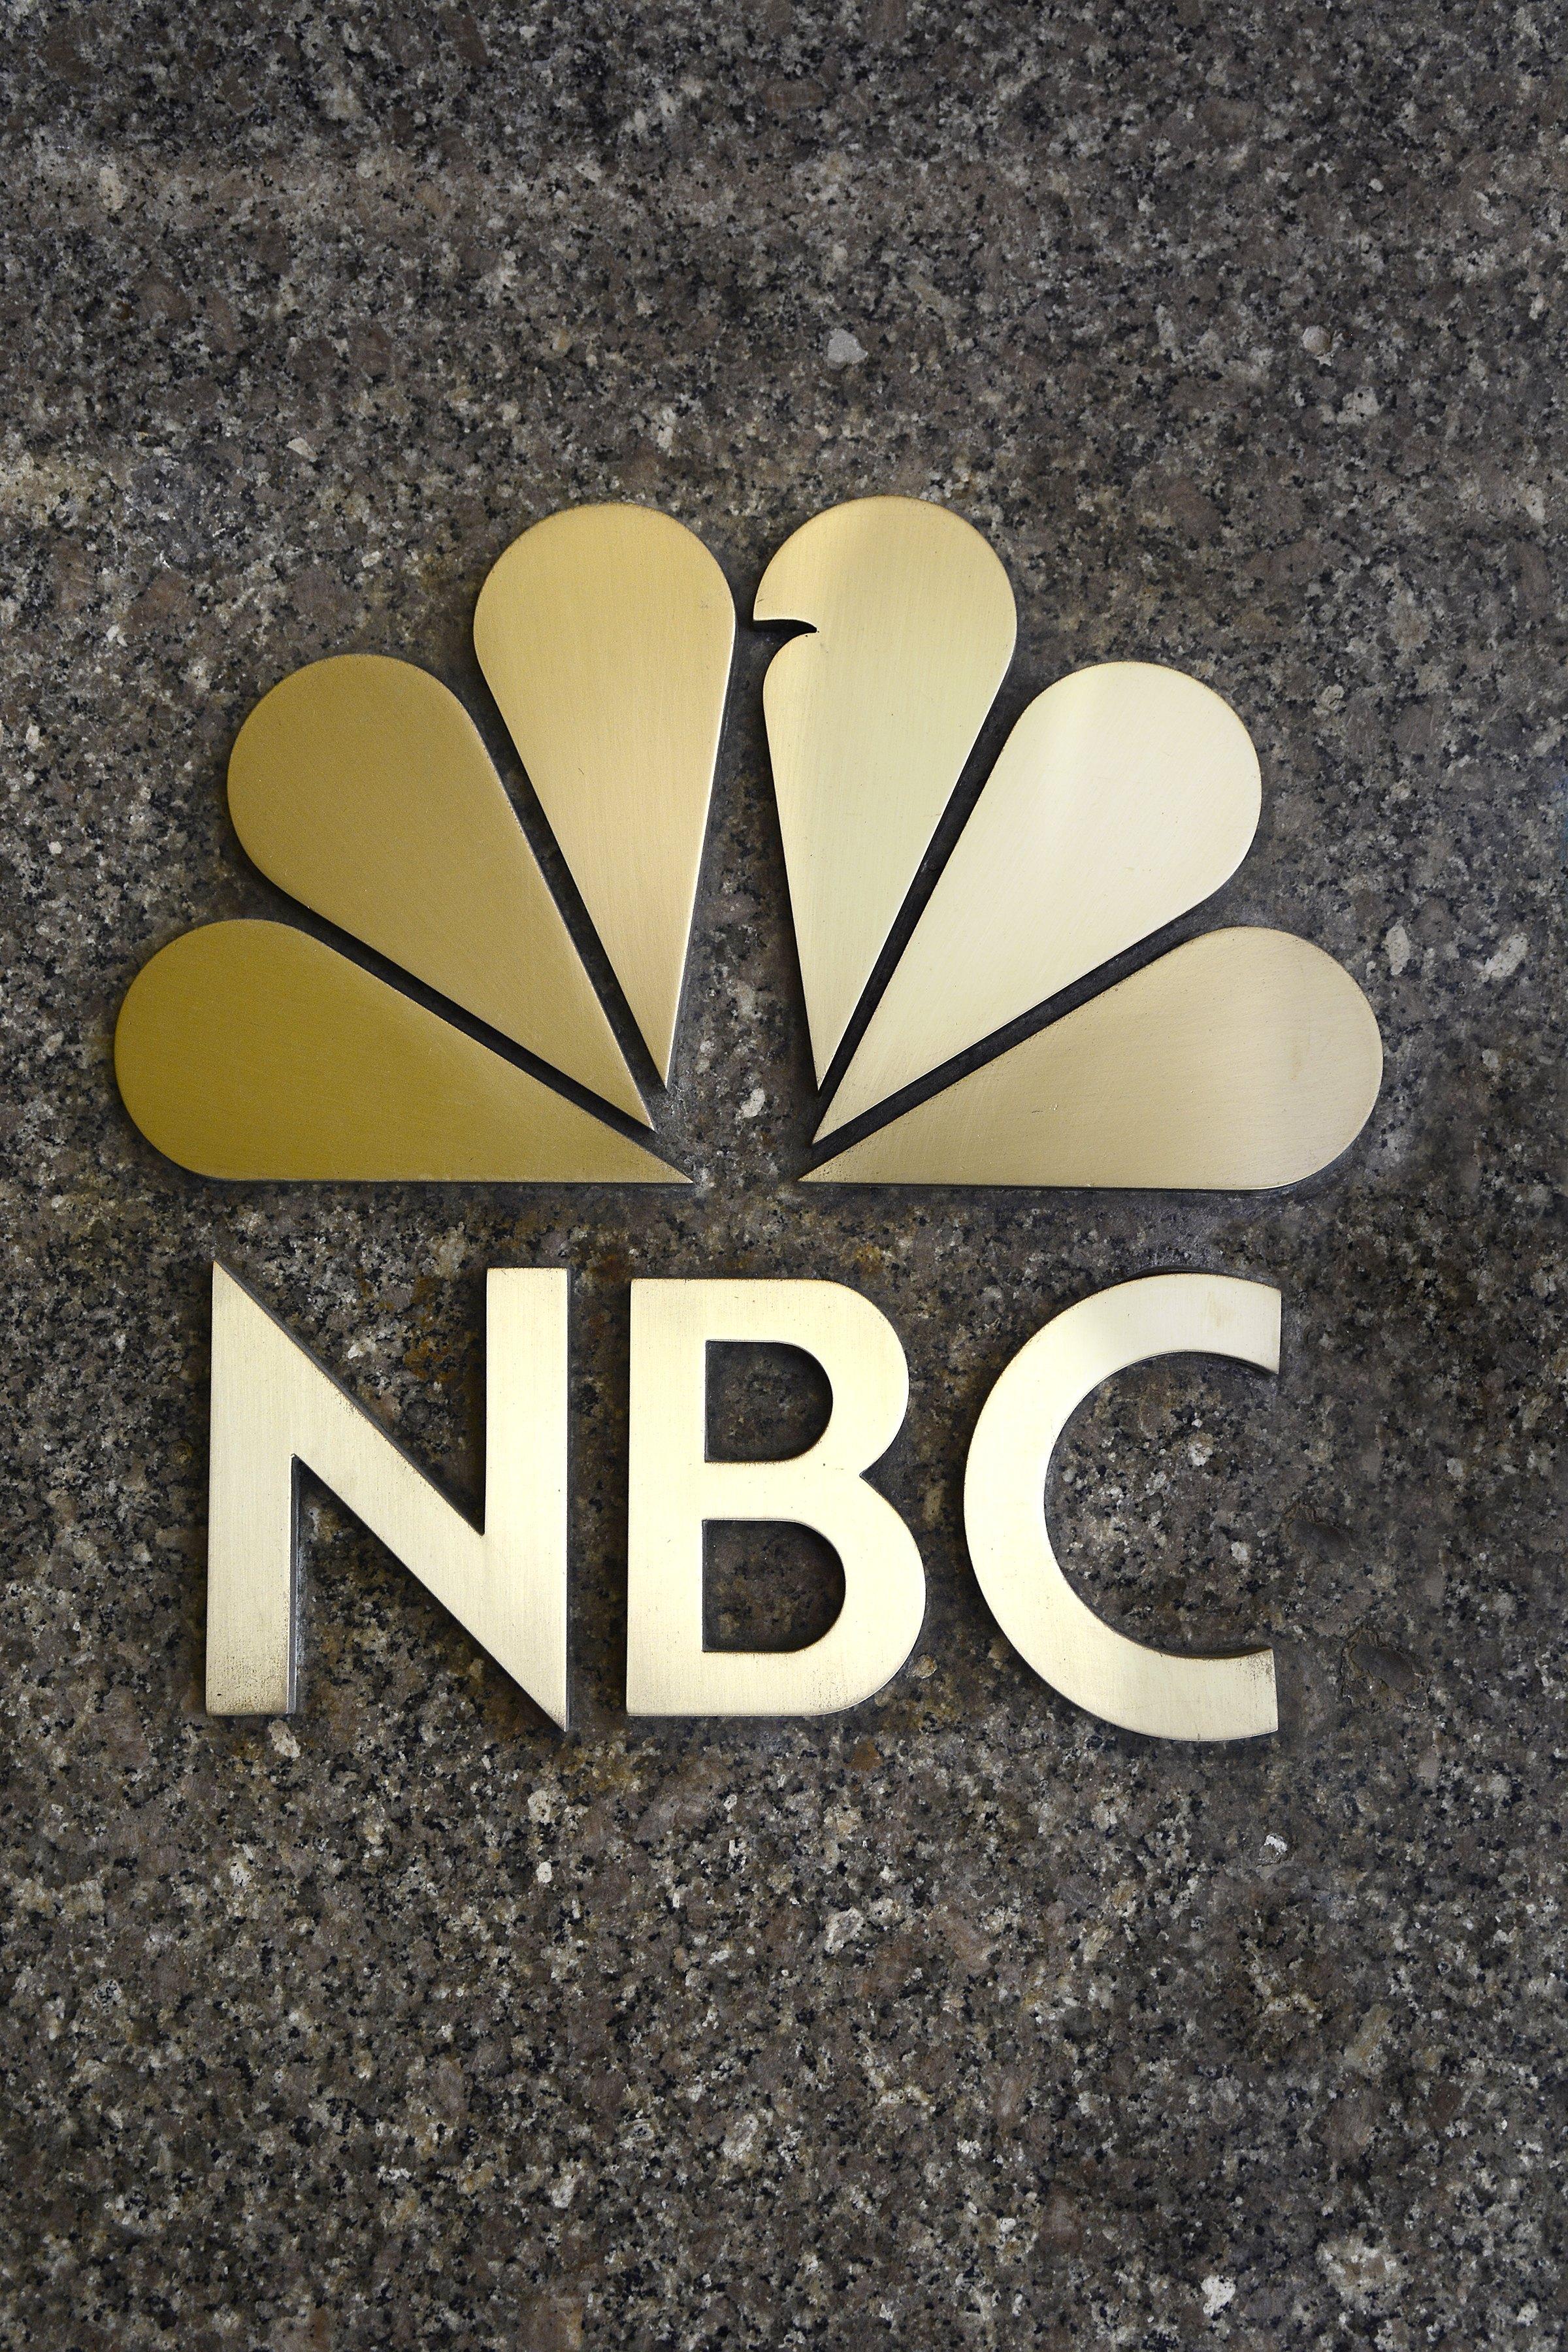 NBC logo (Robert Alexander/Getty Images)